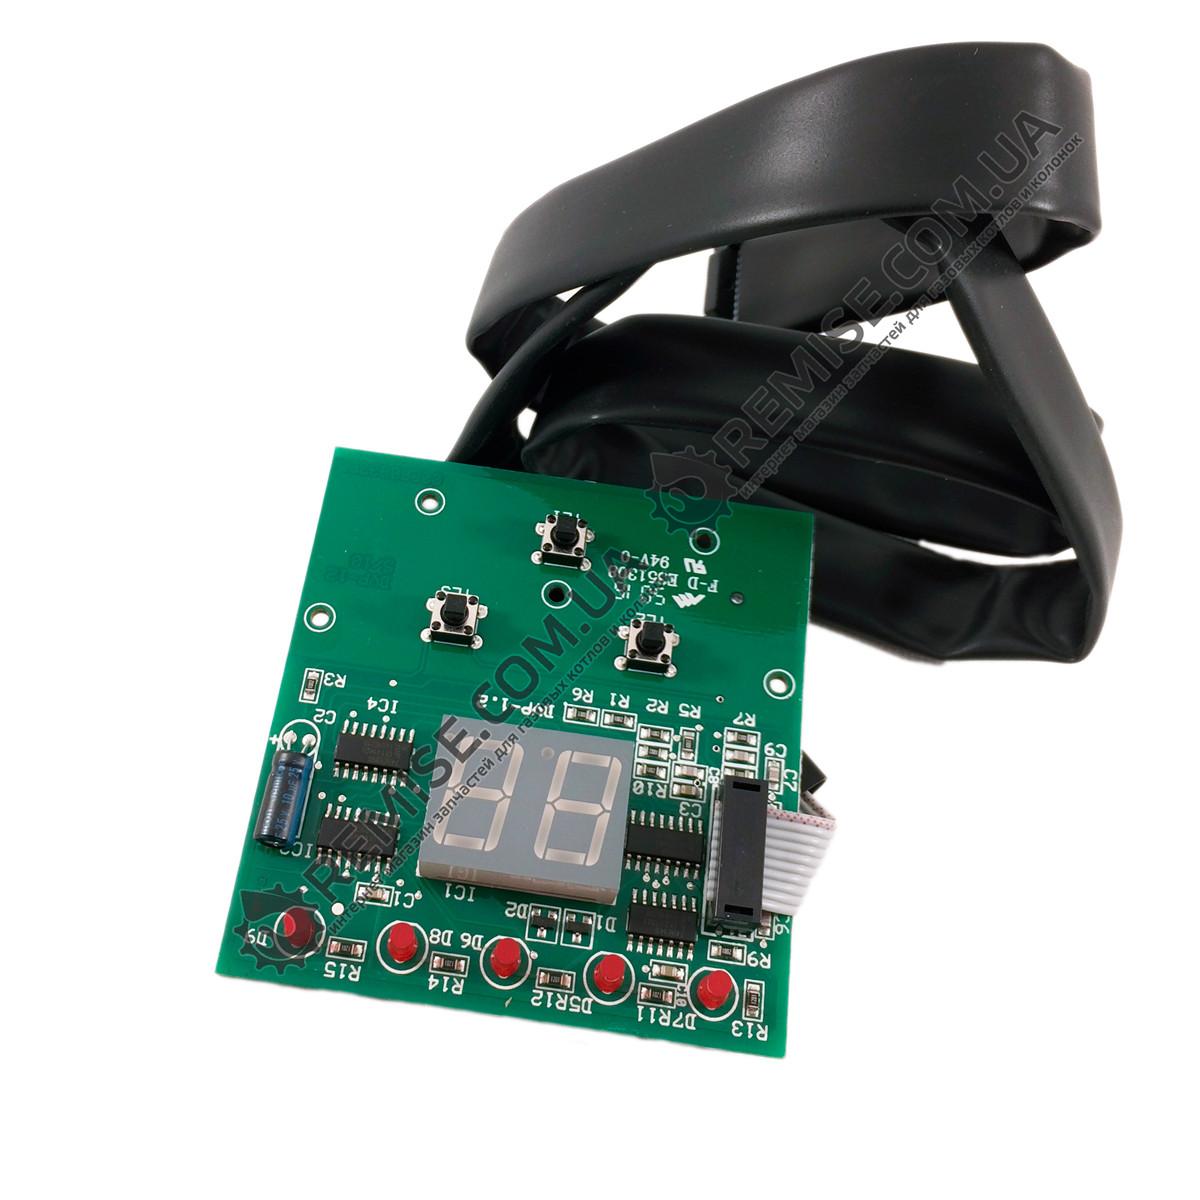 Плата дисплея Protherm Скат 6-28 кВт К13 - 0020094661